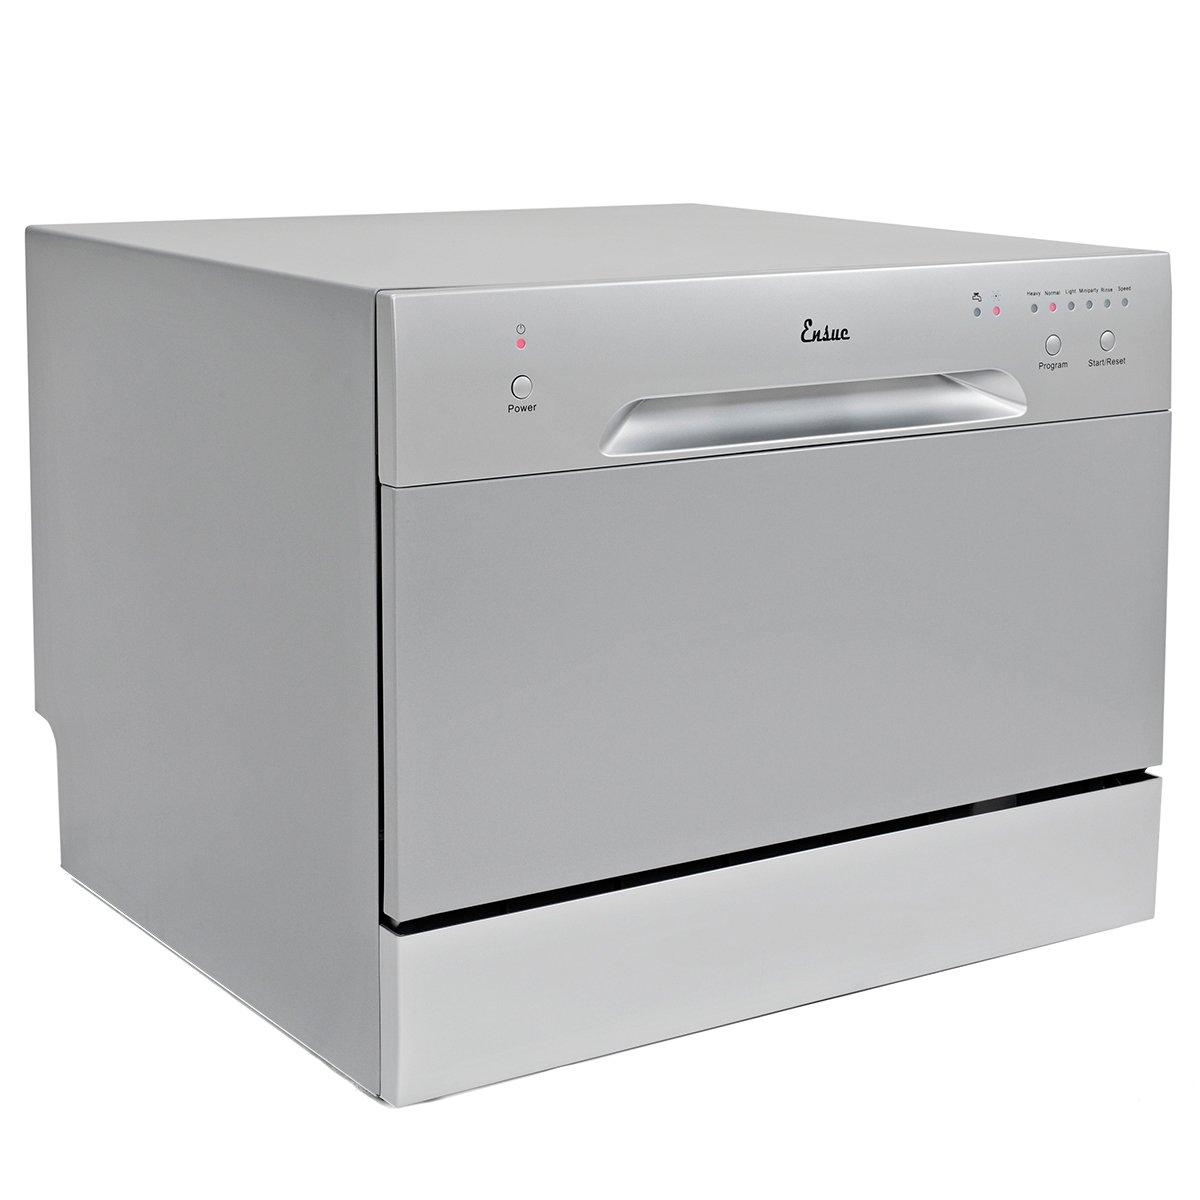 ... Countertop Dishwasher Portable Compact Dishwashing Machine Silver